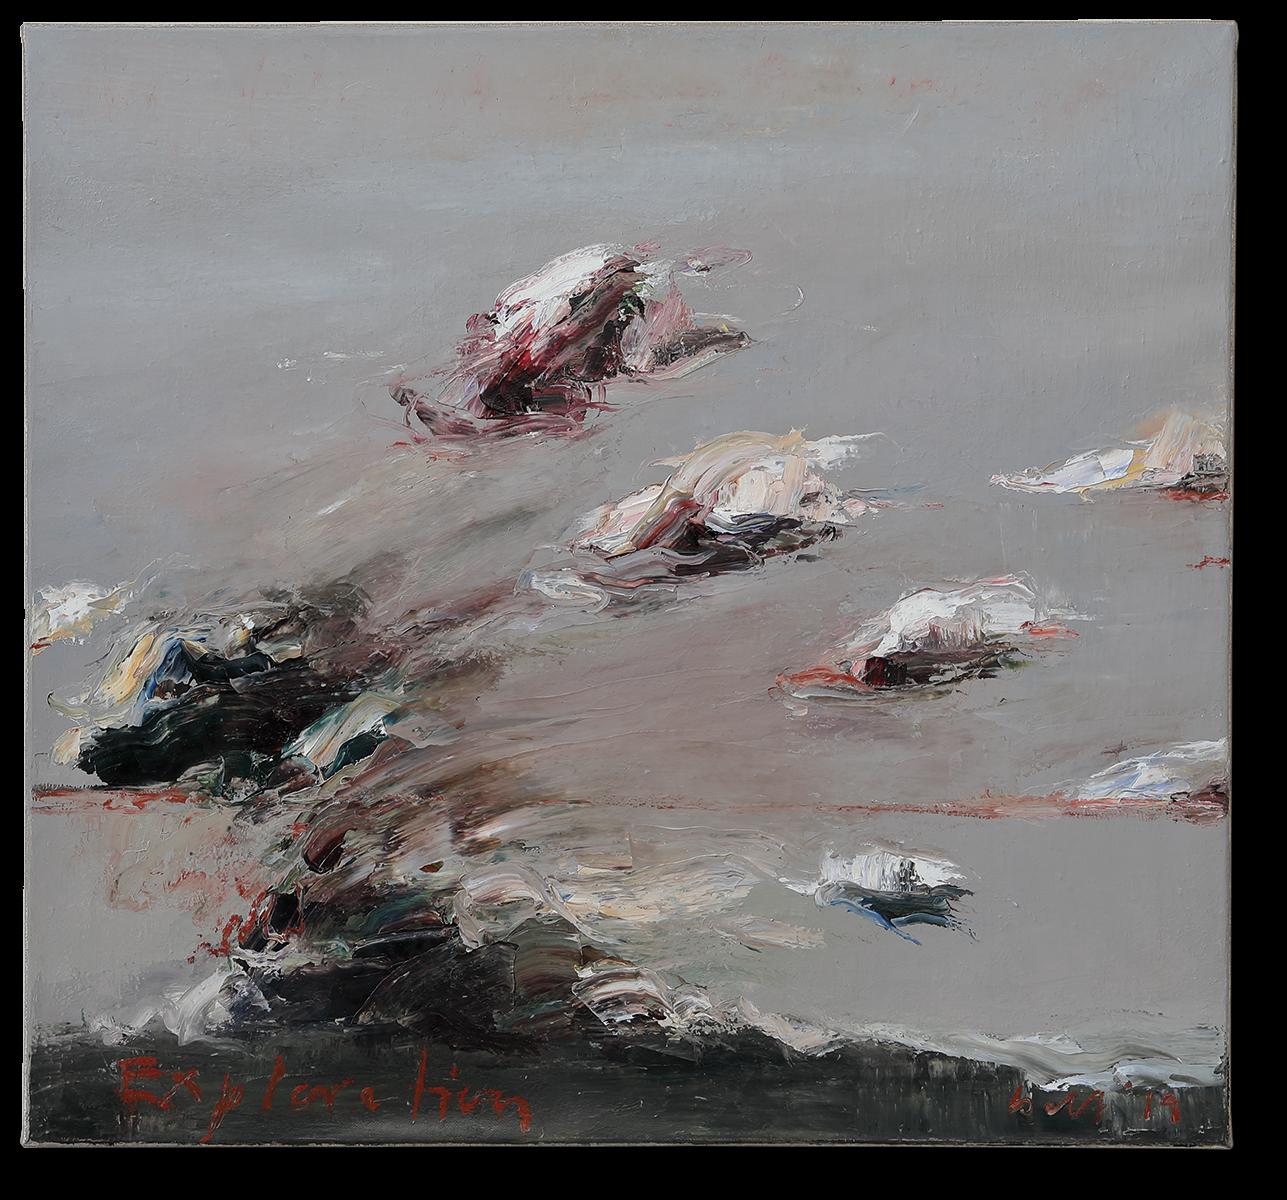 Exploration | 2019 | Öl auf Leinwand | 65 x 70cm